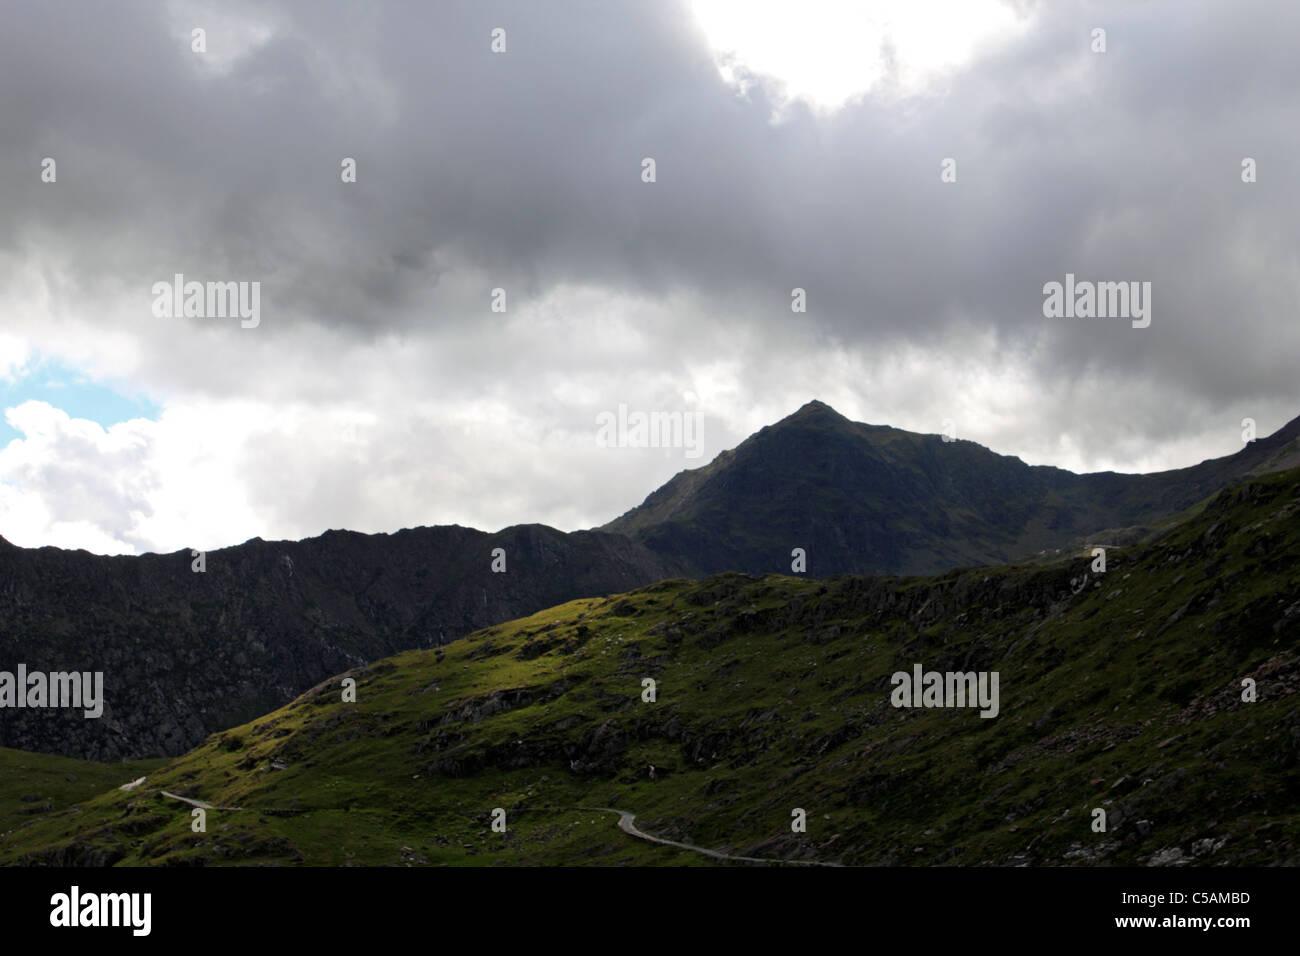 Mount Snowdon, Snowdonia National Park Wales UK - Stock Image